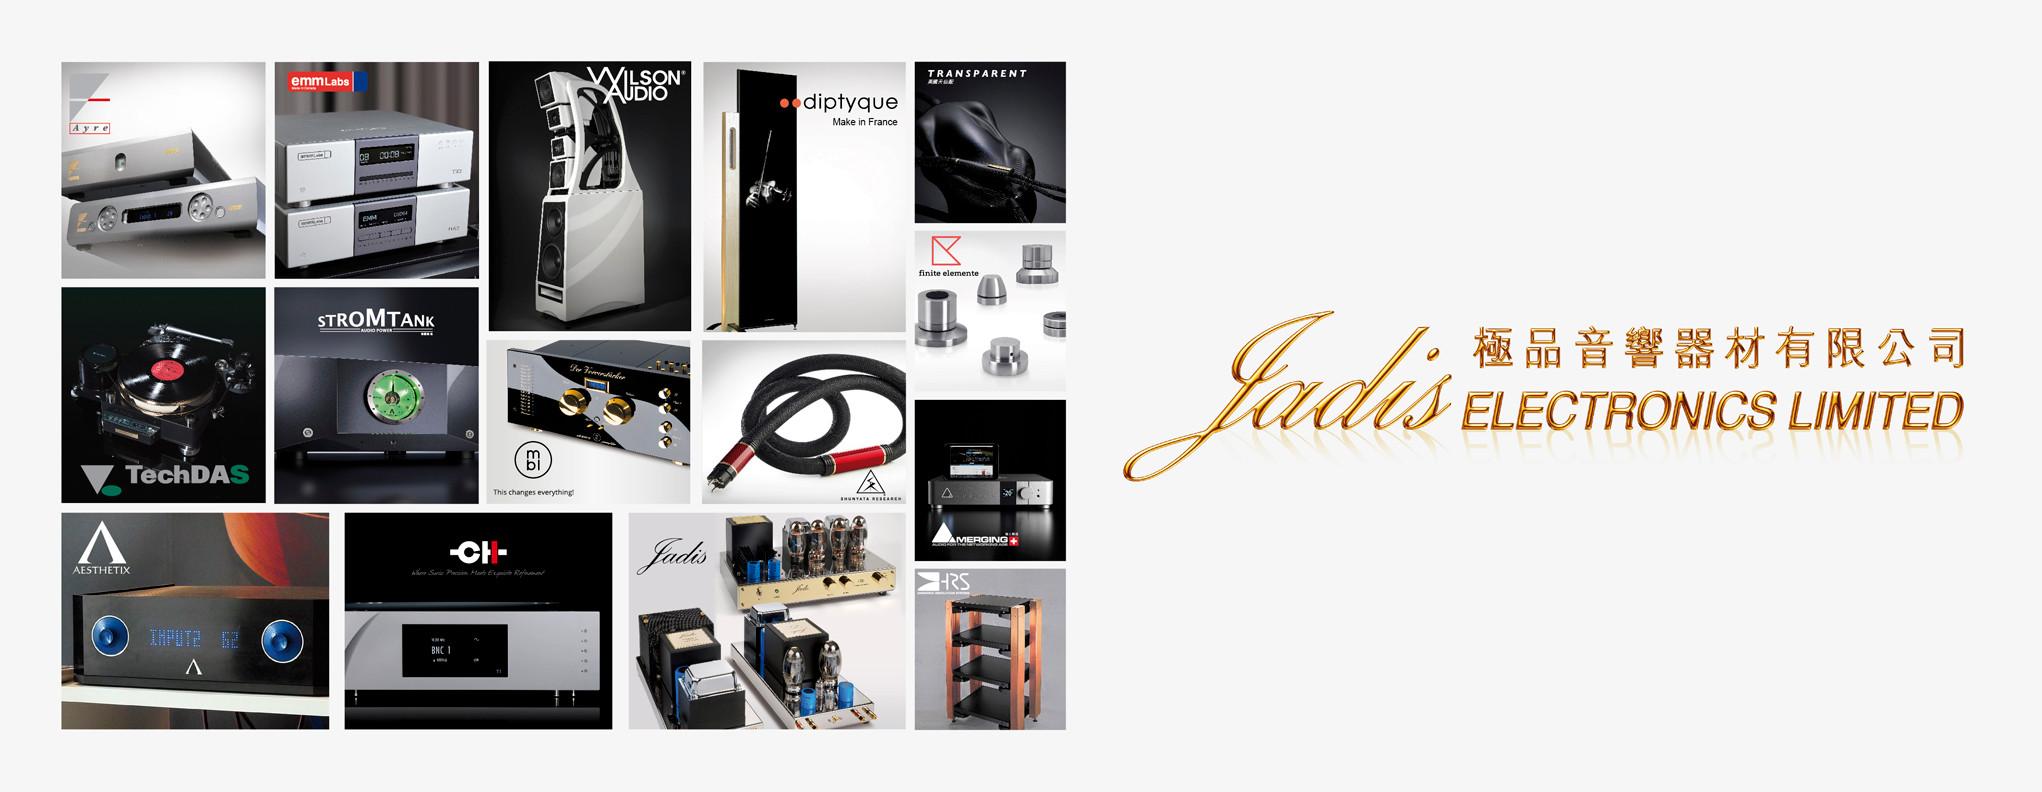 JadisGroup-2042x792-01.jpg